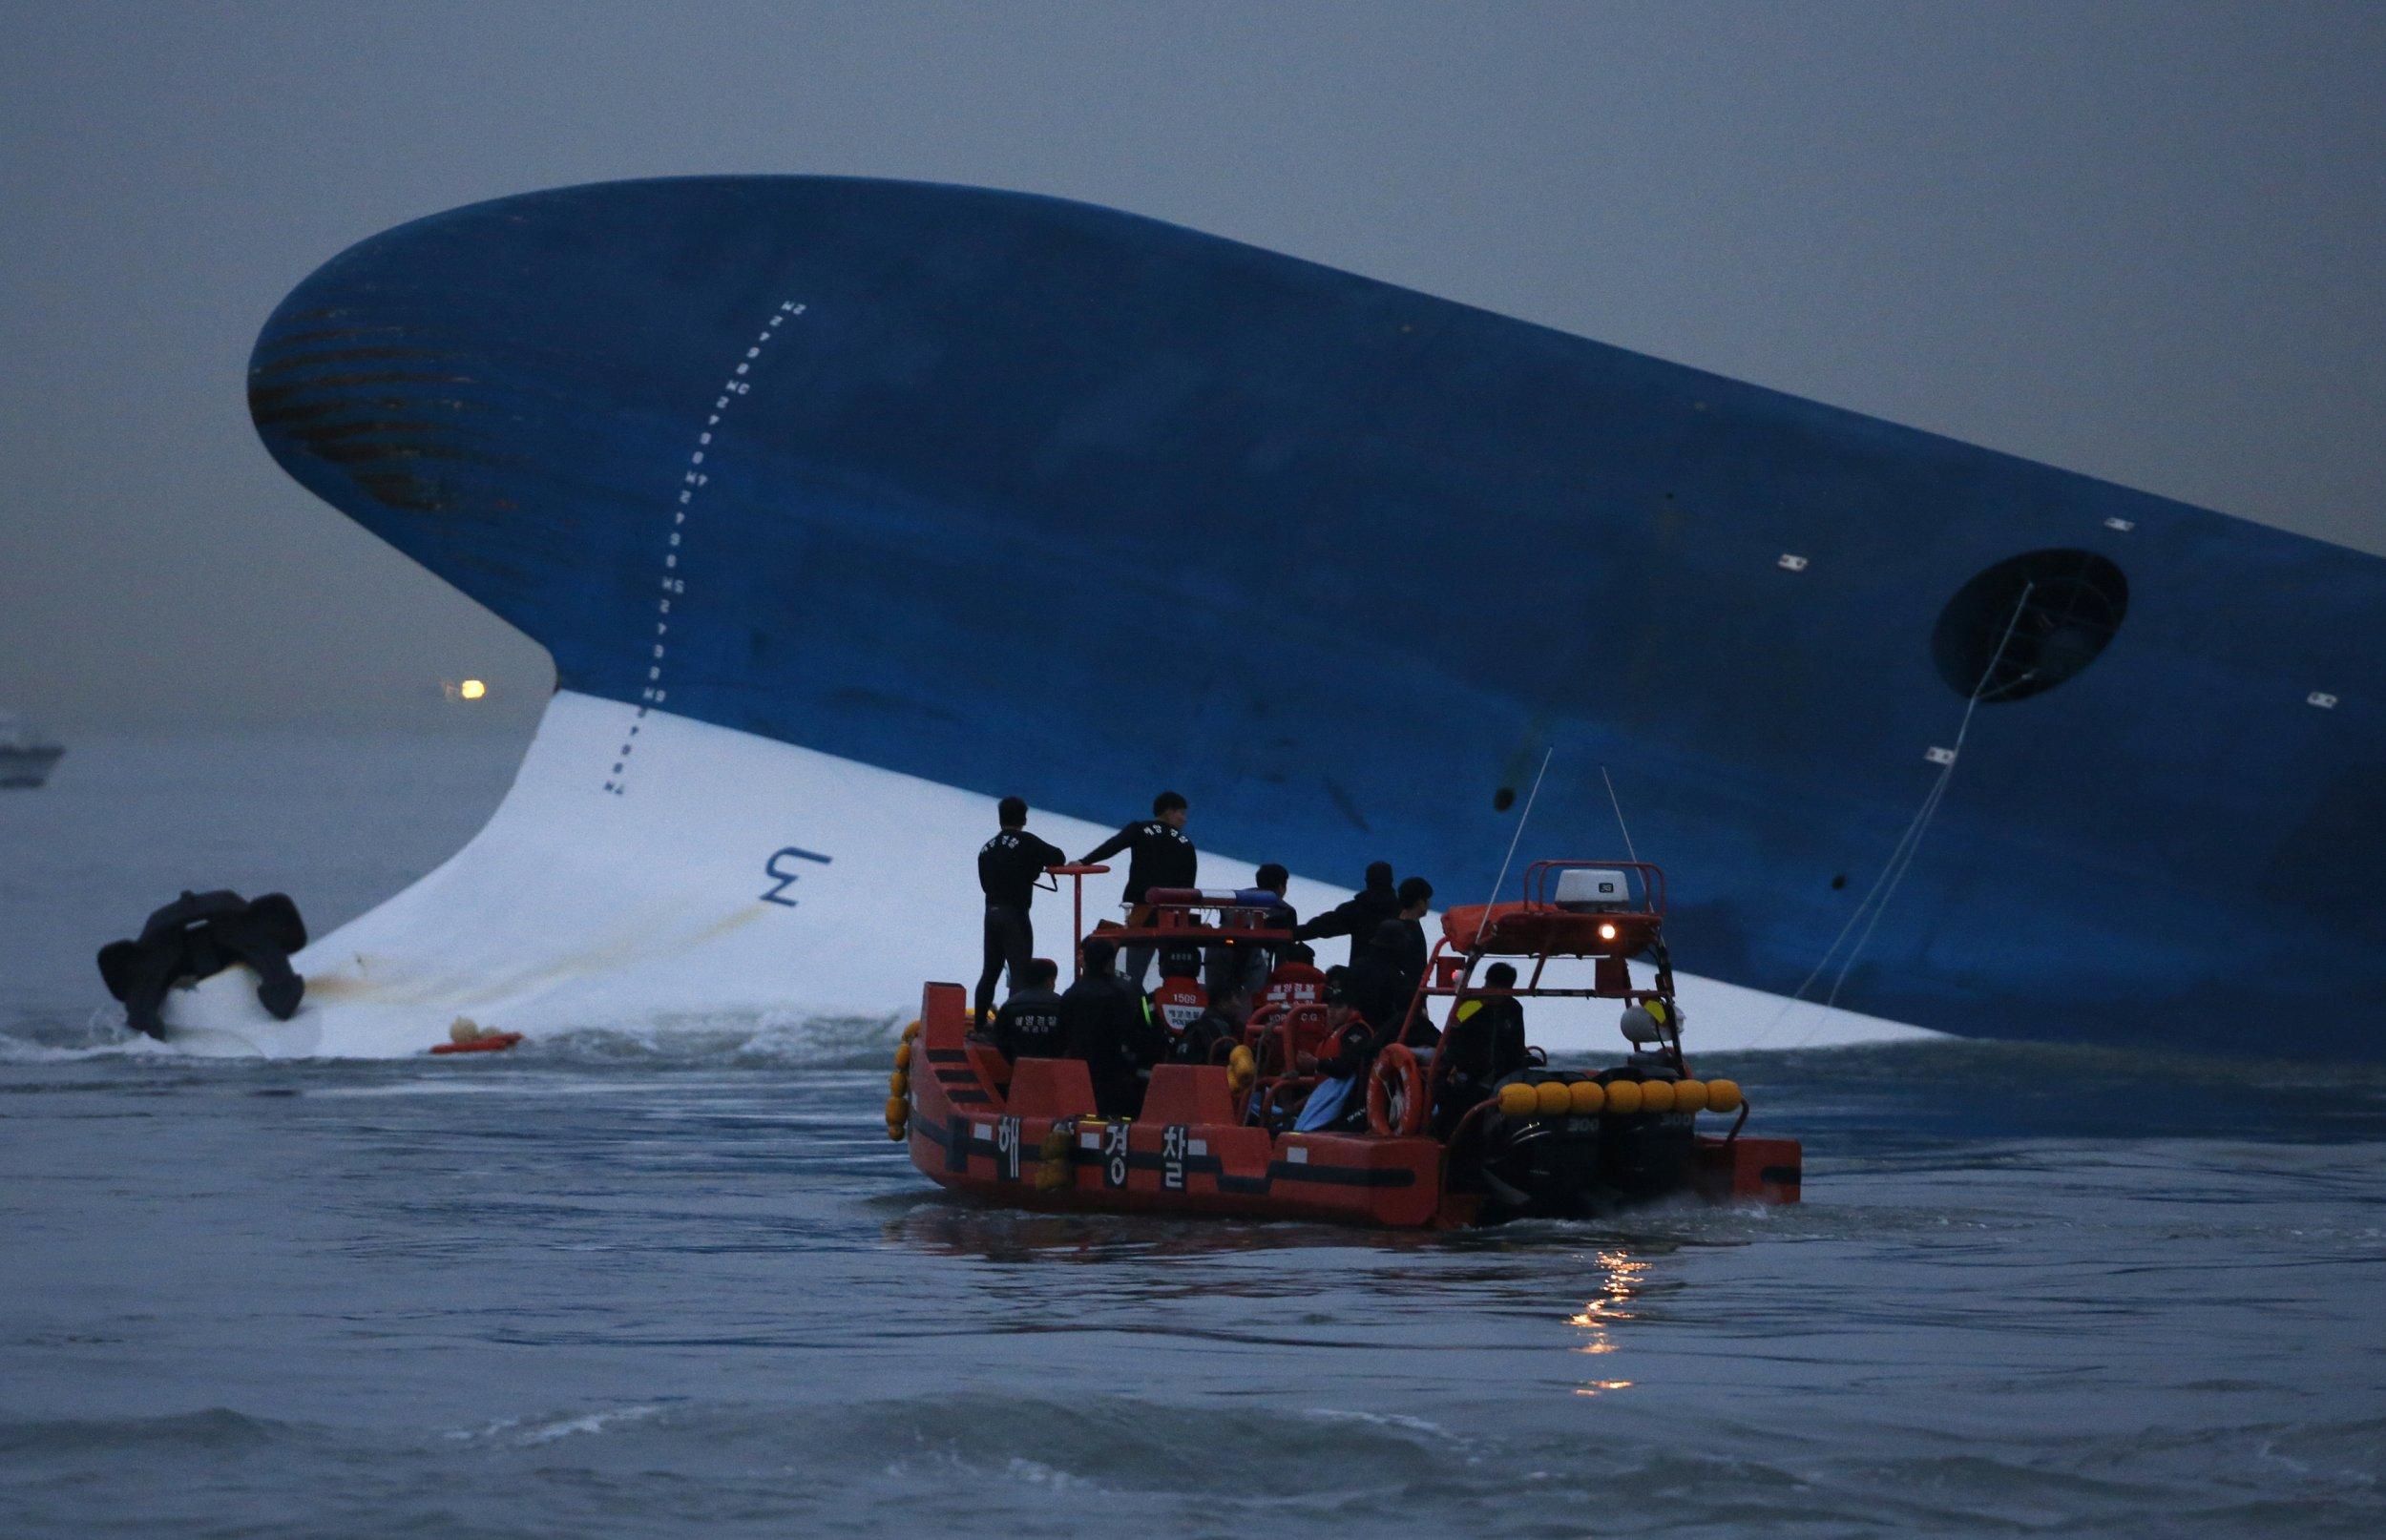 Sinking South Korean ferry